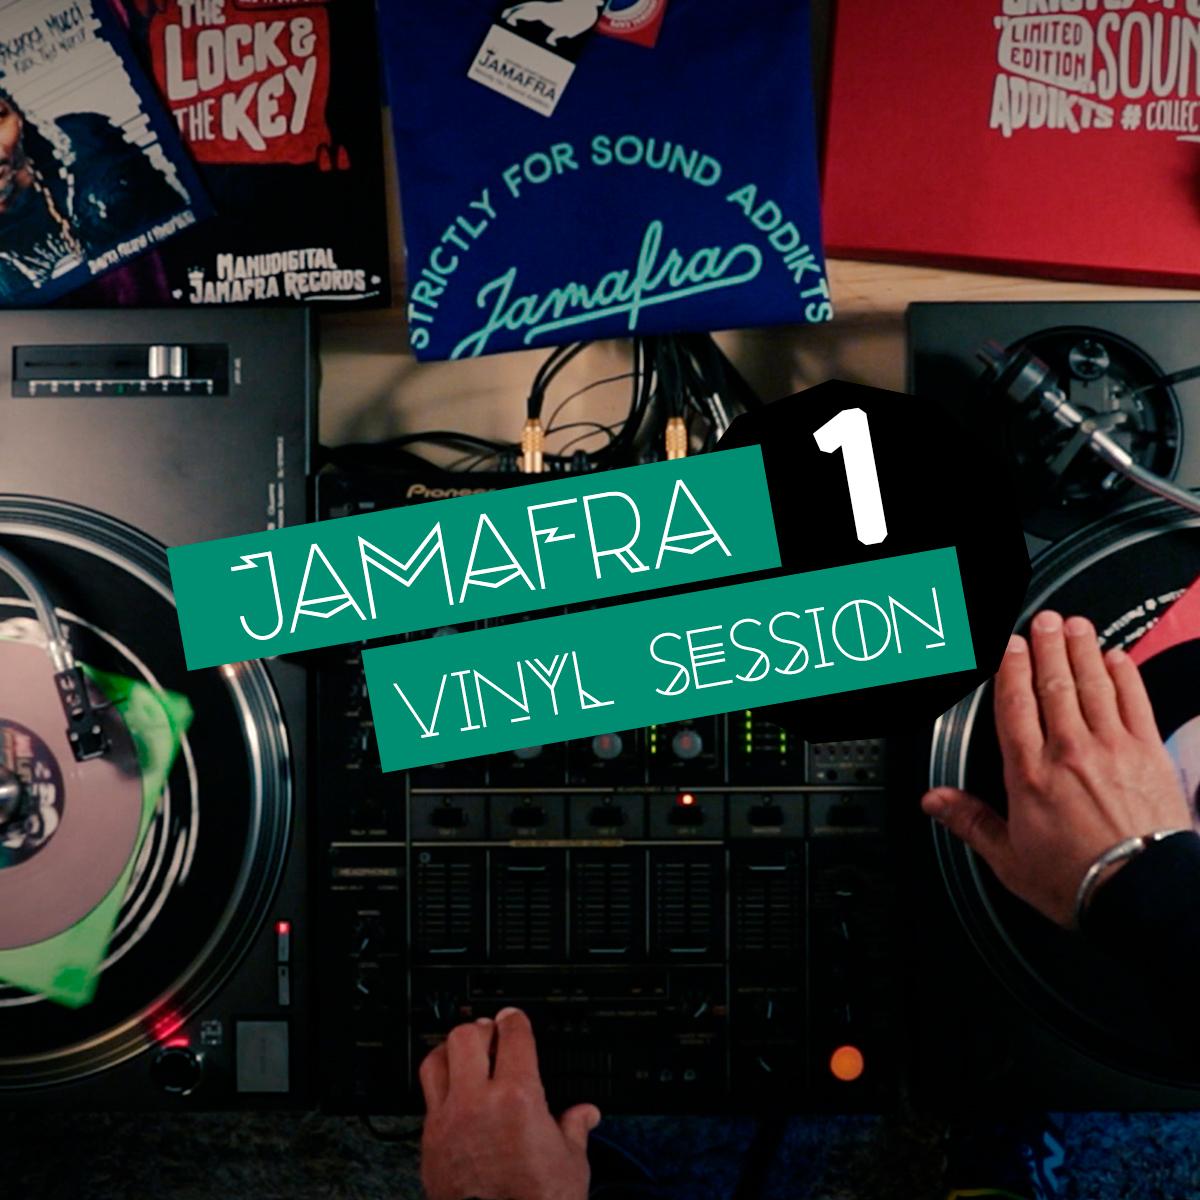 LIVE MIX : Jamafra Vinyl Session n°1